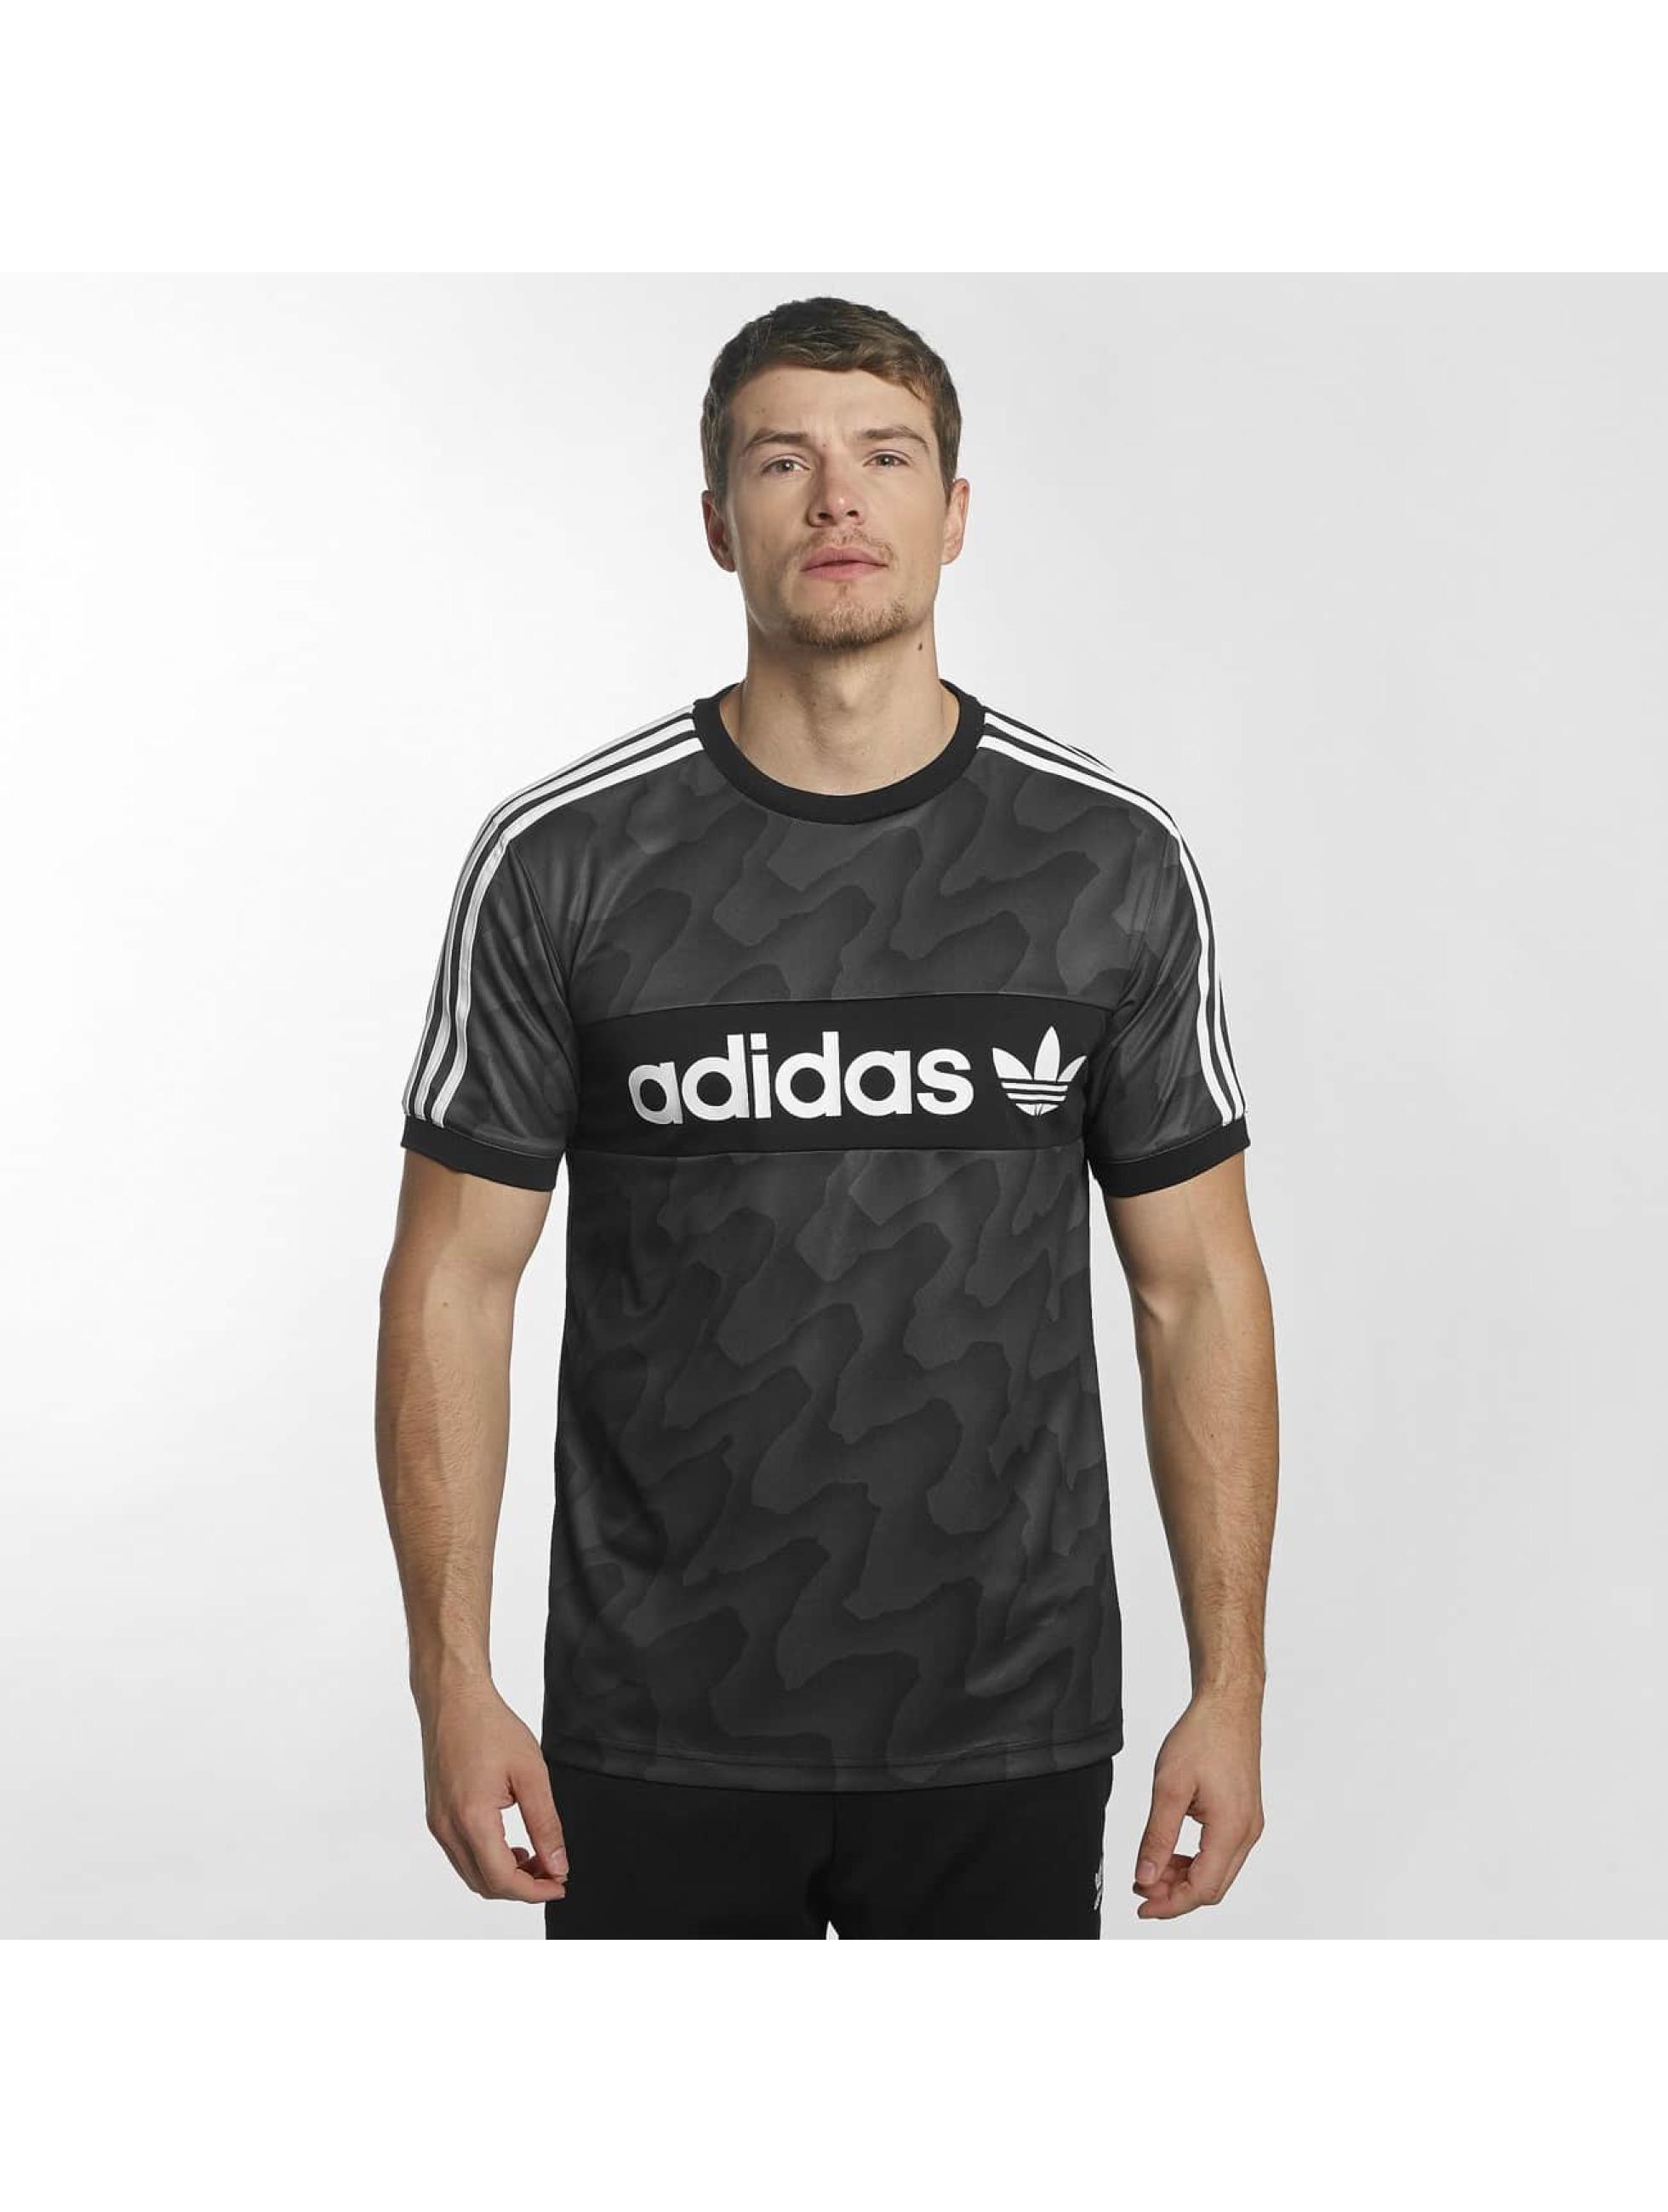 adidas T-shirt Clima Club svart